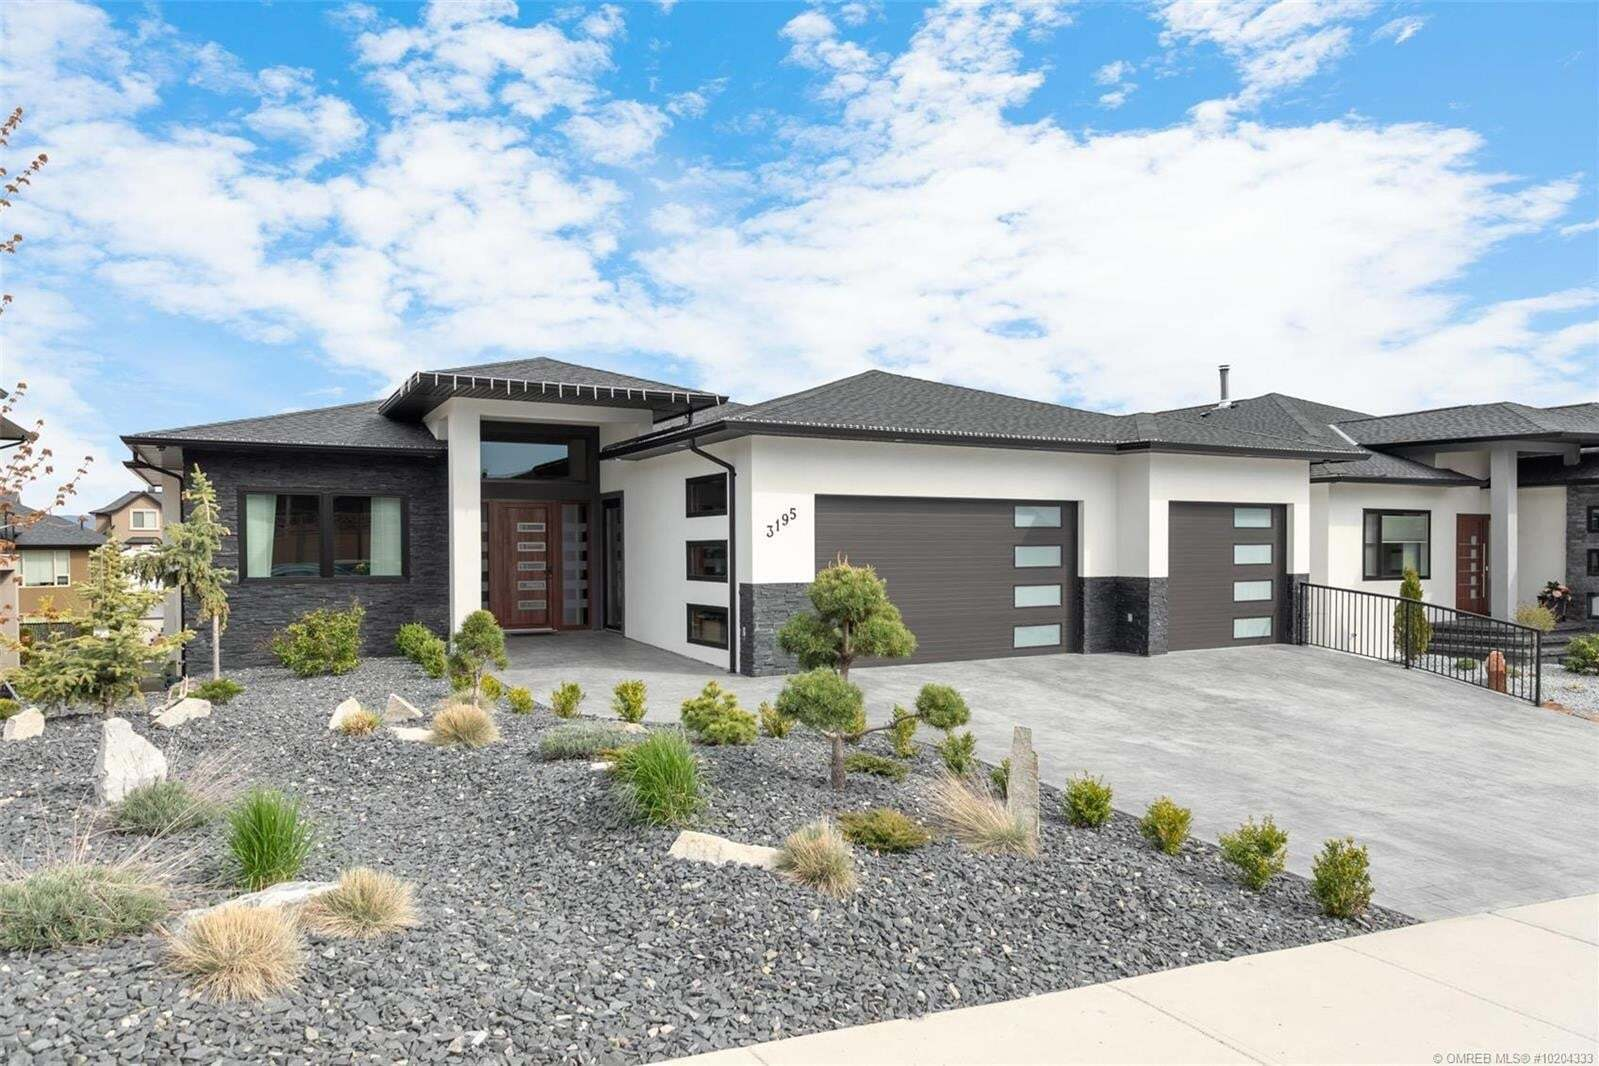 House for sale at 3195 Vineyard View Wy West Kelowna British Columbia - MLS: 10204333